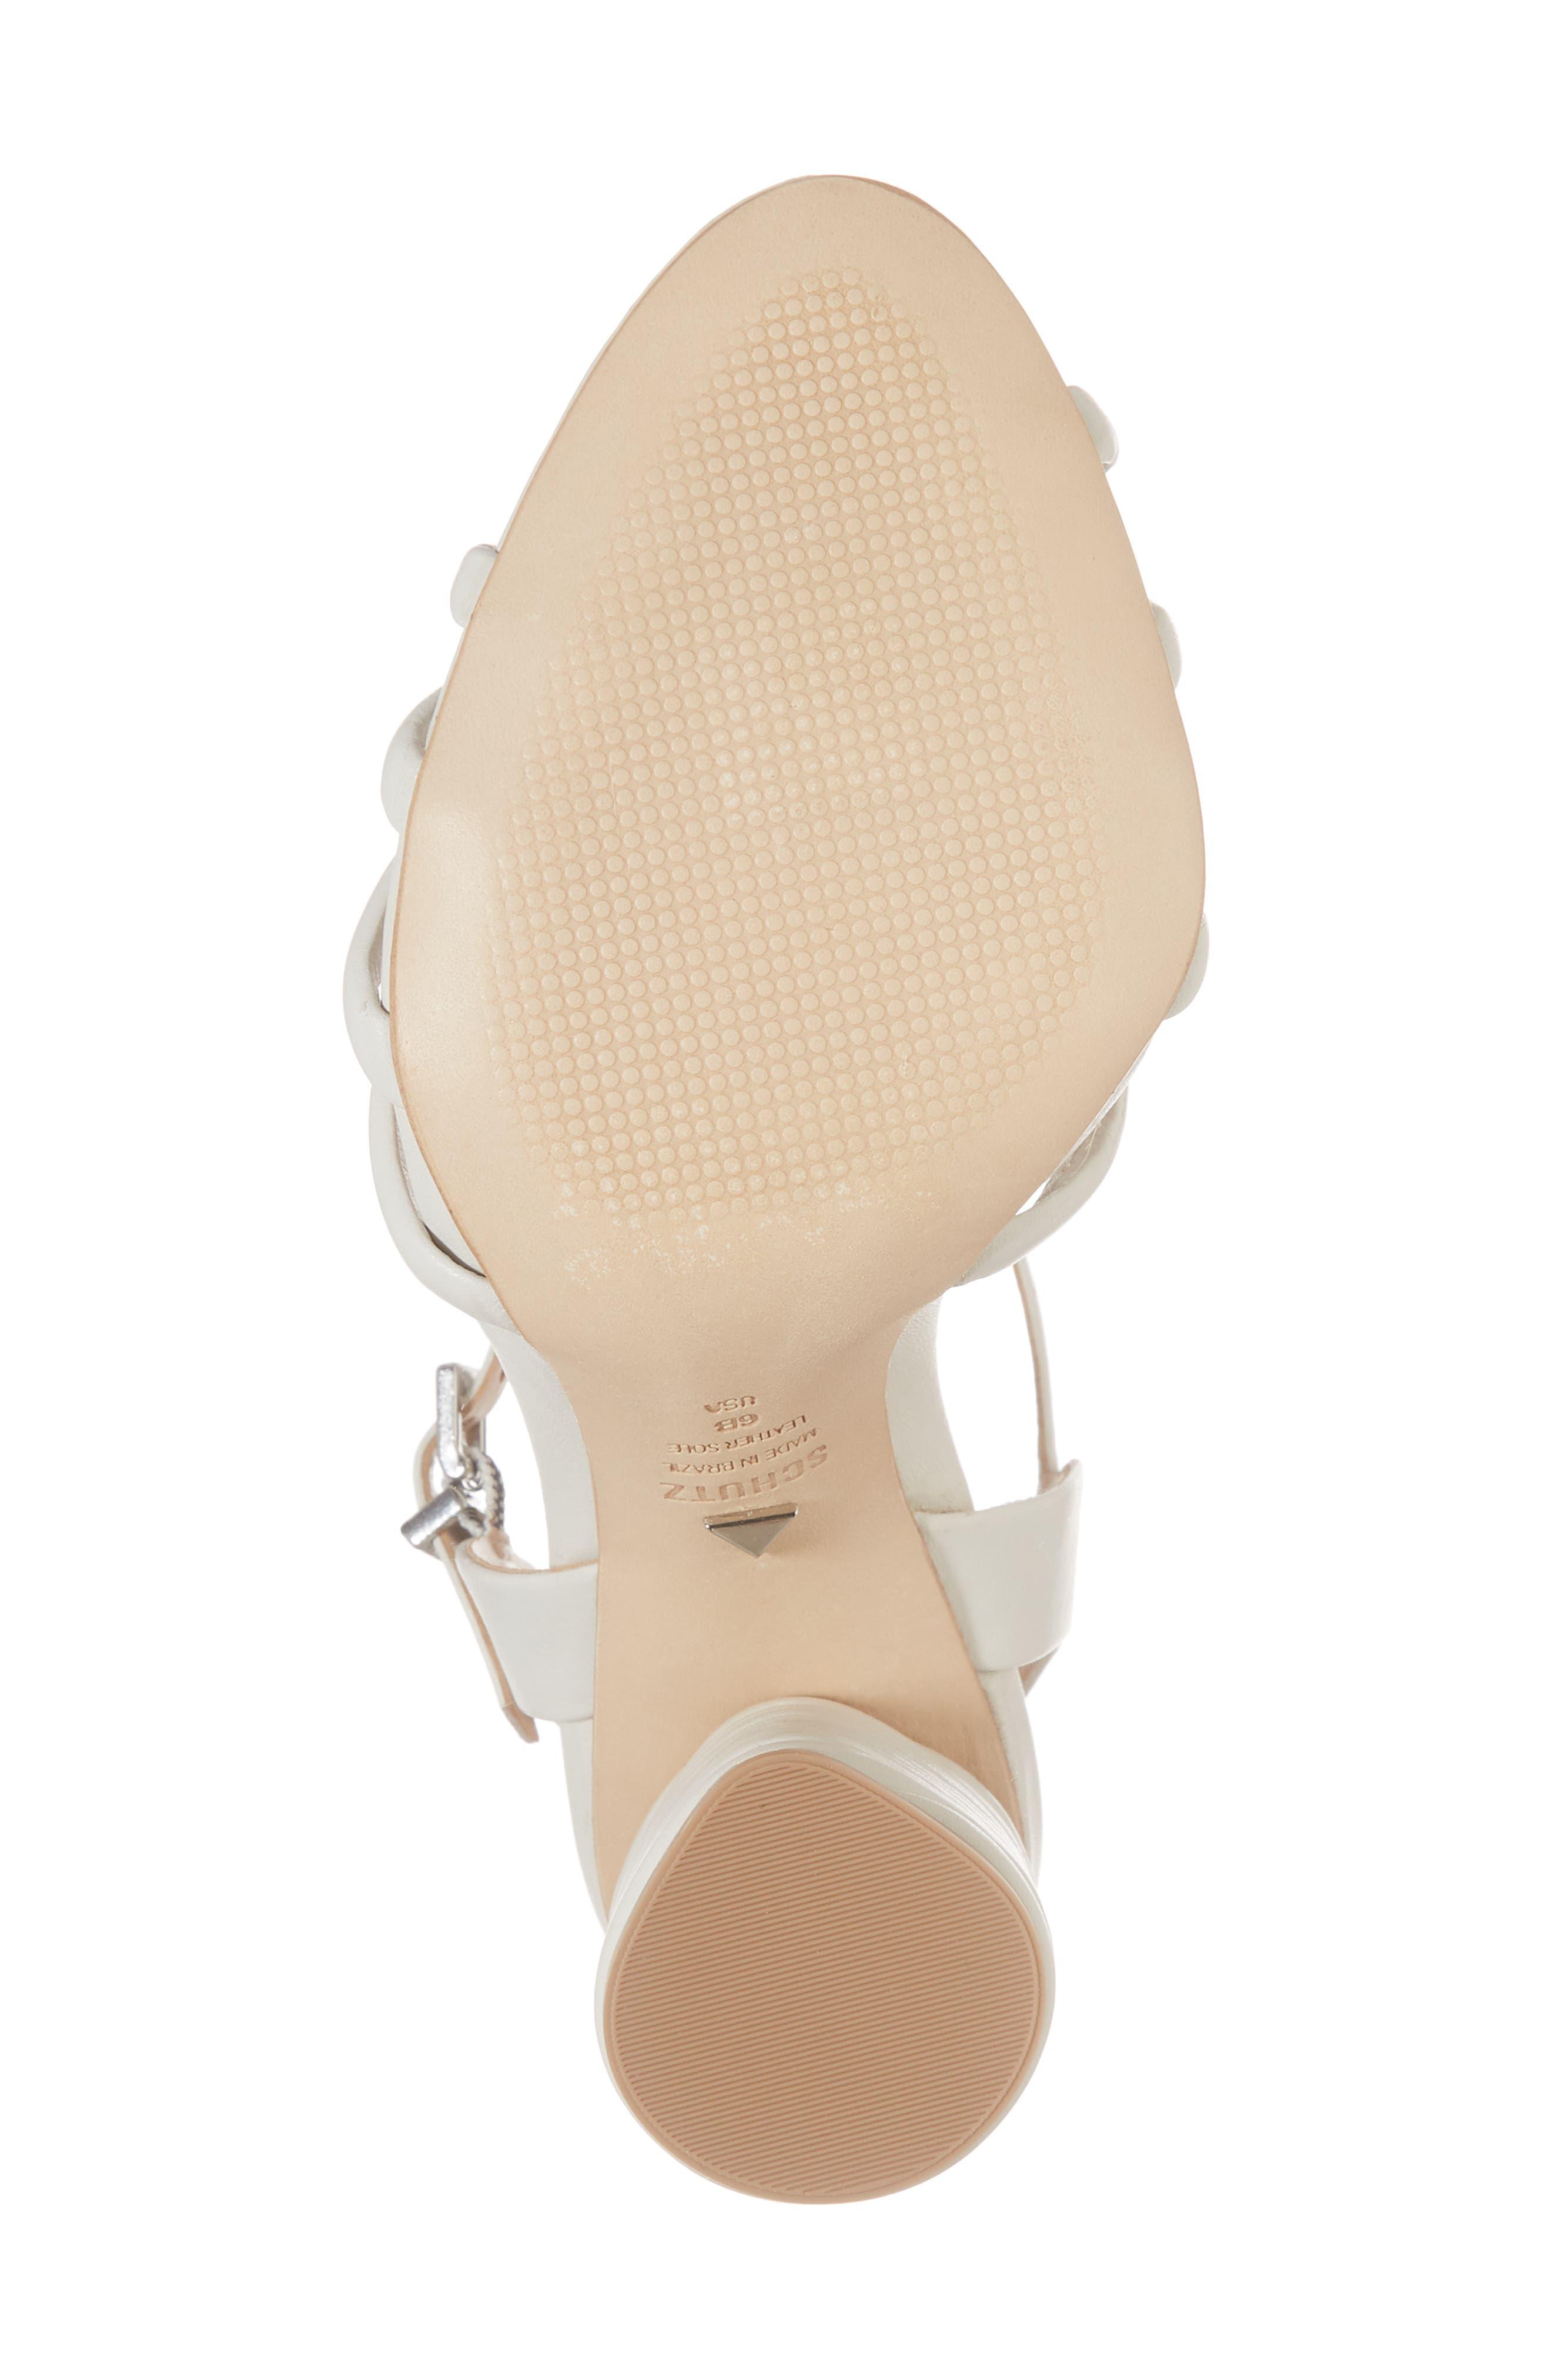 Paolla Column Heel Sandal,                             Alternate thumbnail 6, color,                             100